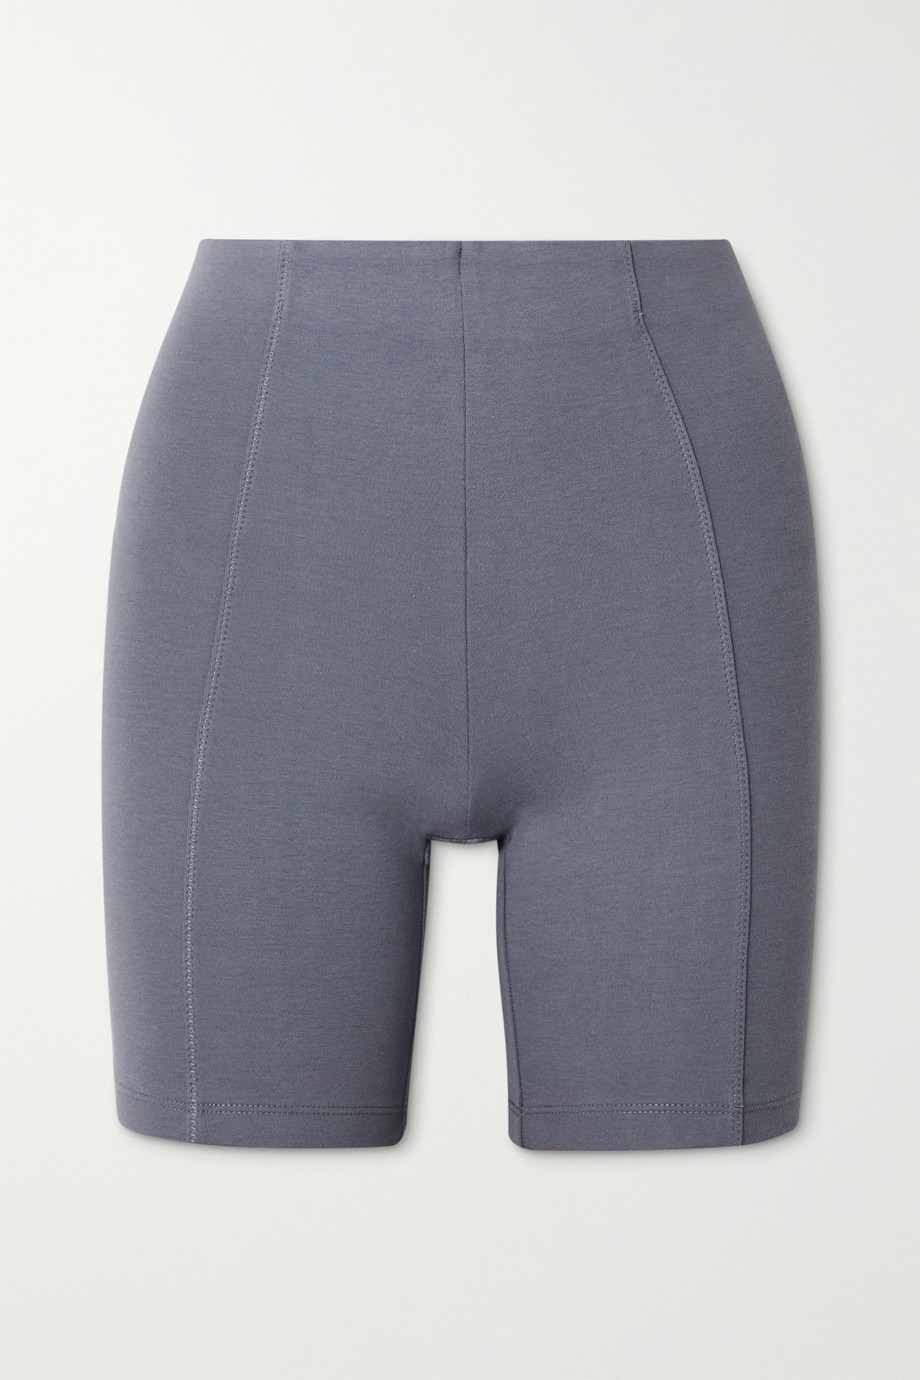 Ninety Percent + NET SUSTAIN stretch organic cotton-jersey shorts